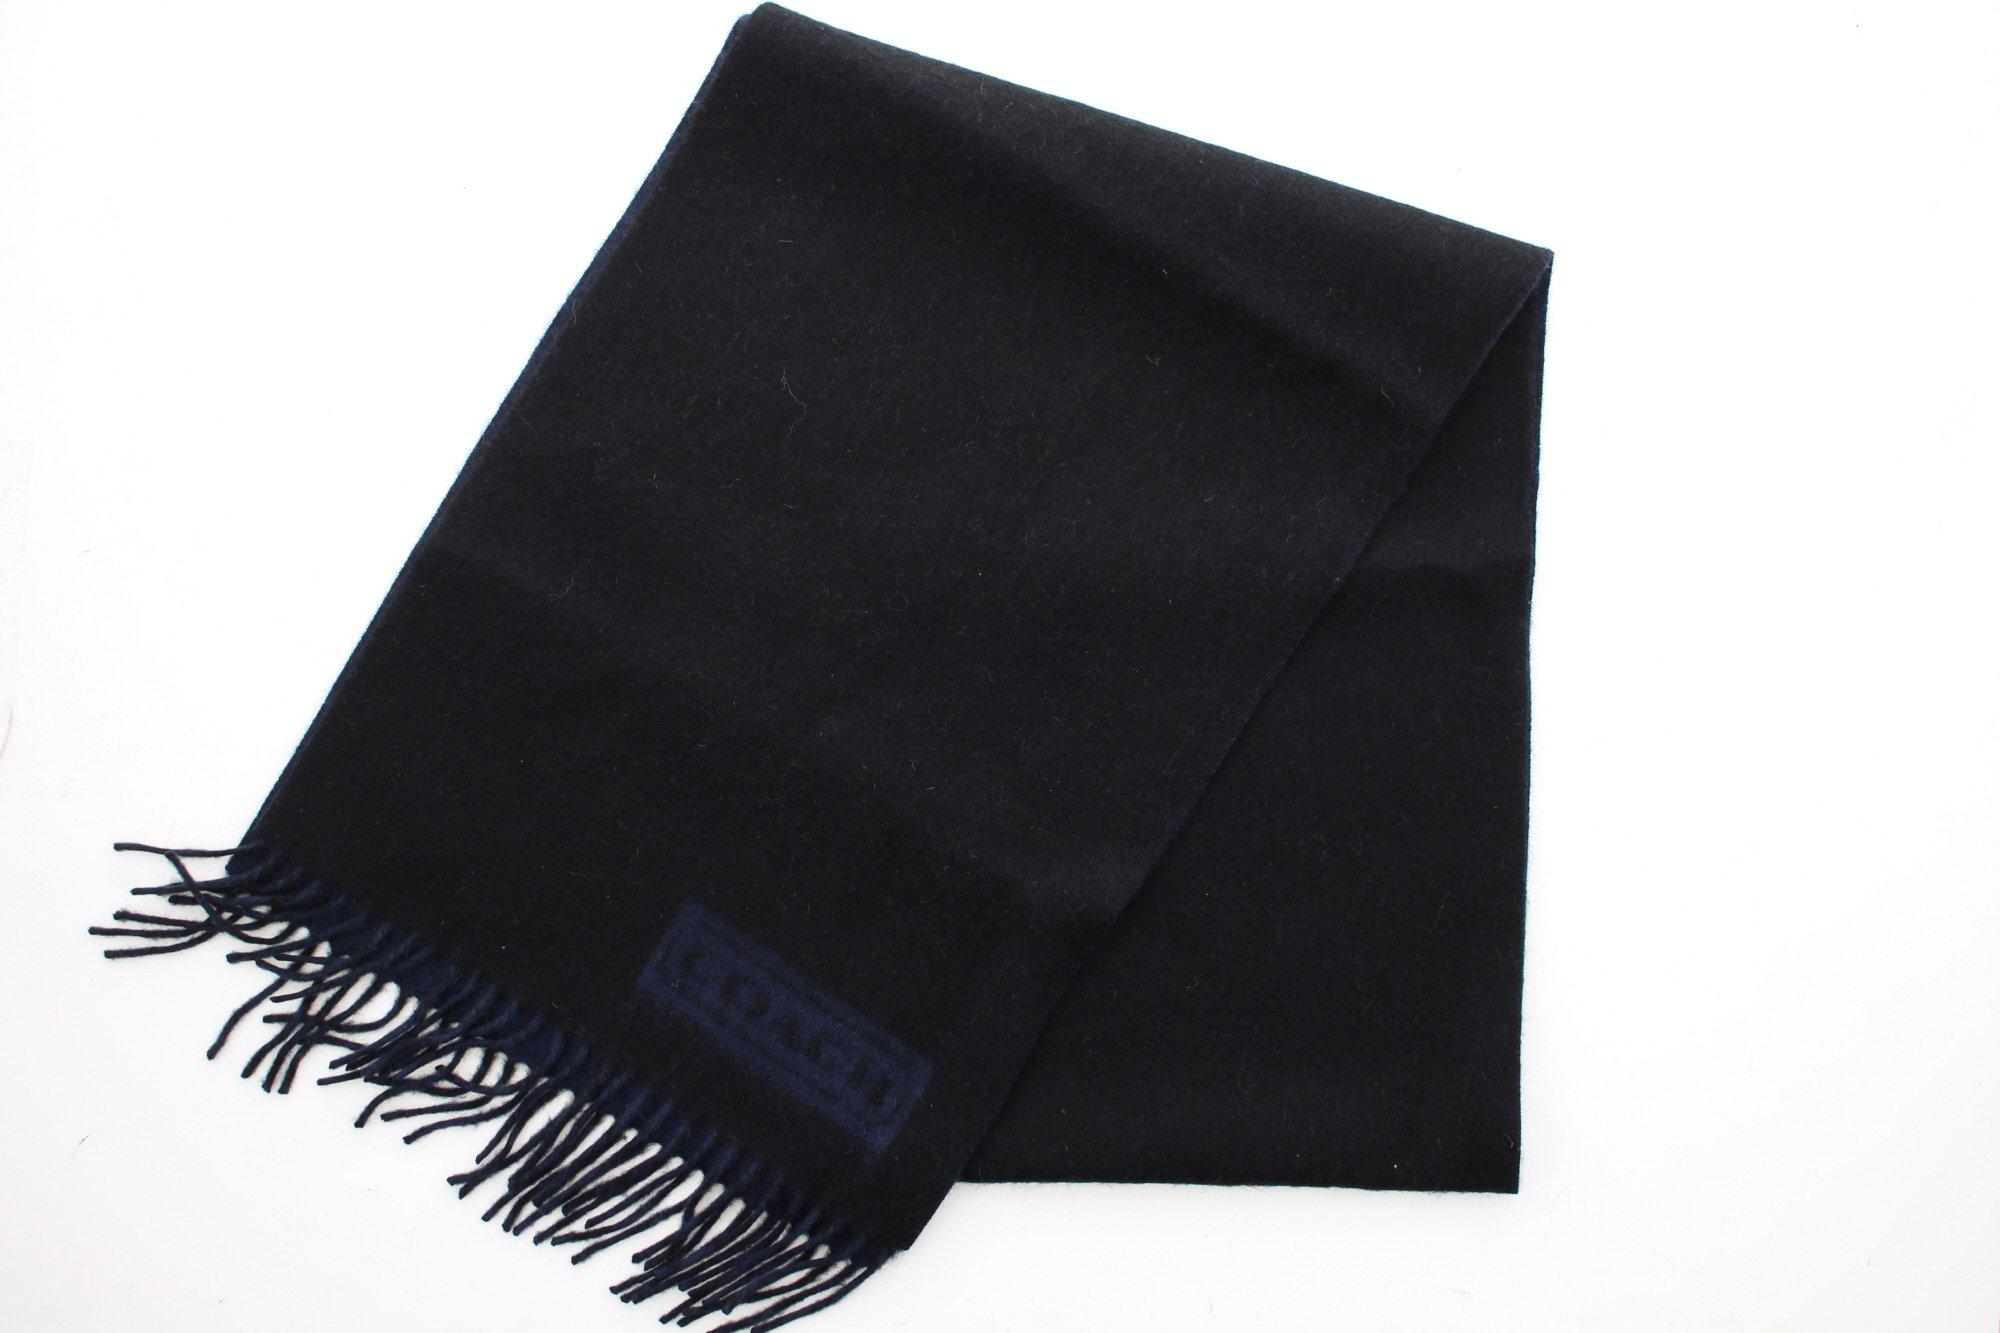 Coach Men's 84080 Lozenge Muffler Scarf 100% Cashmere (Black/Blue) by Coach (Image #1)